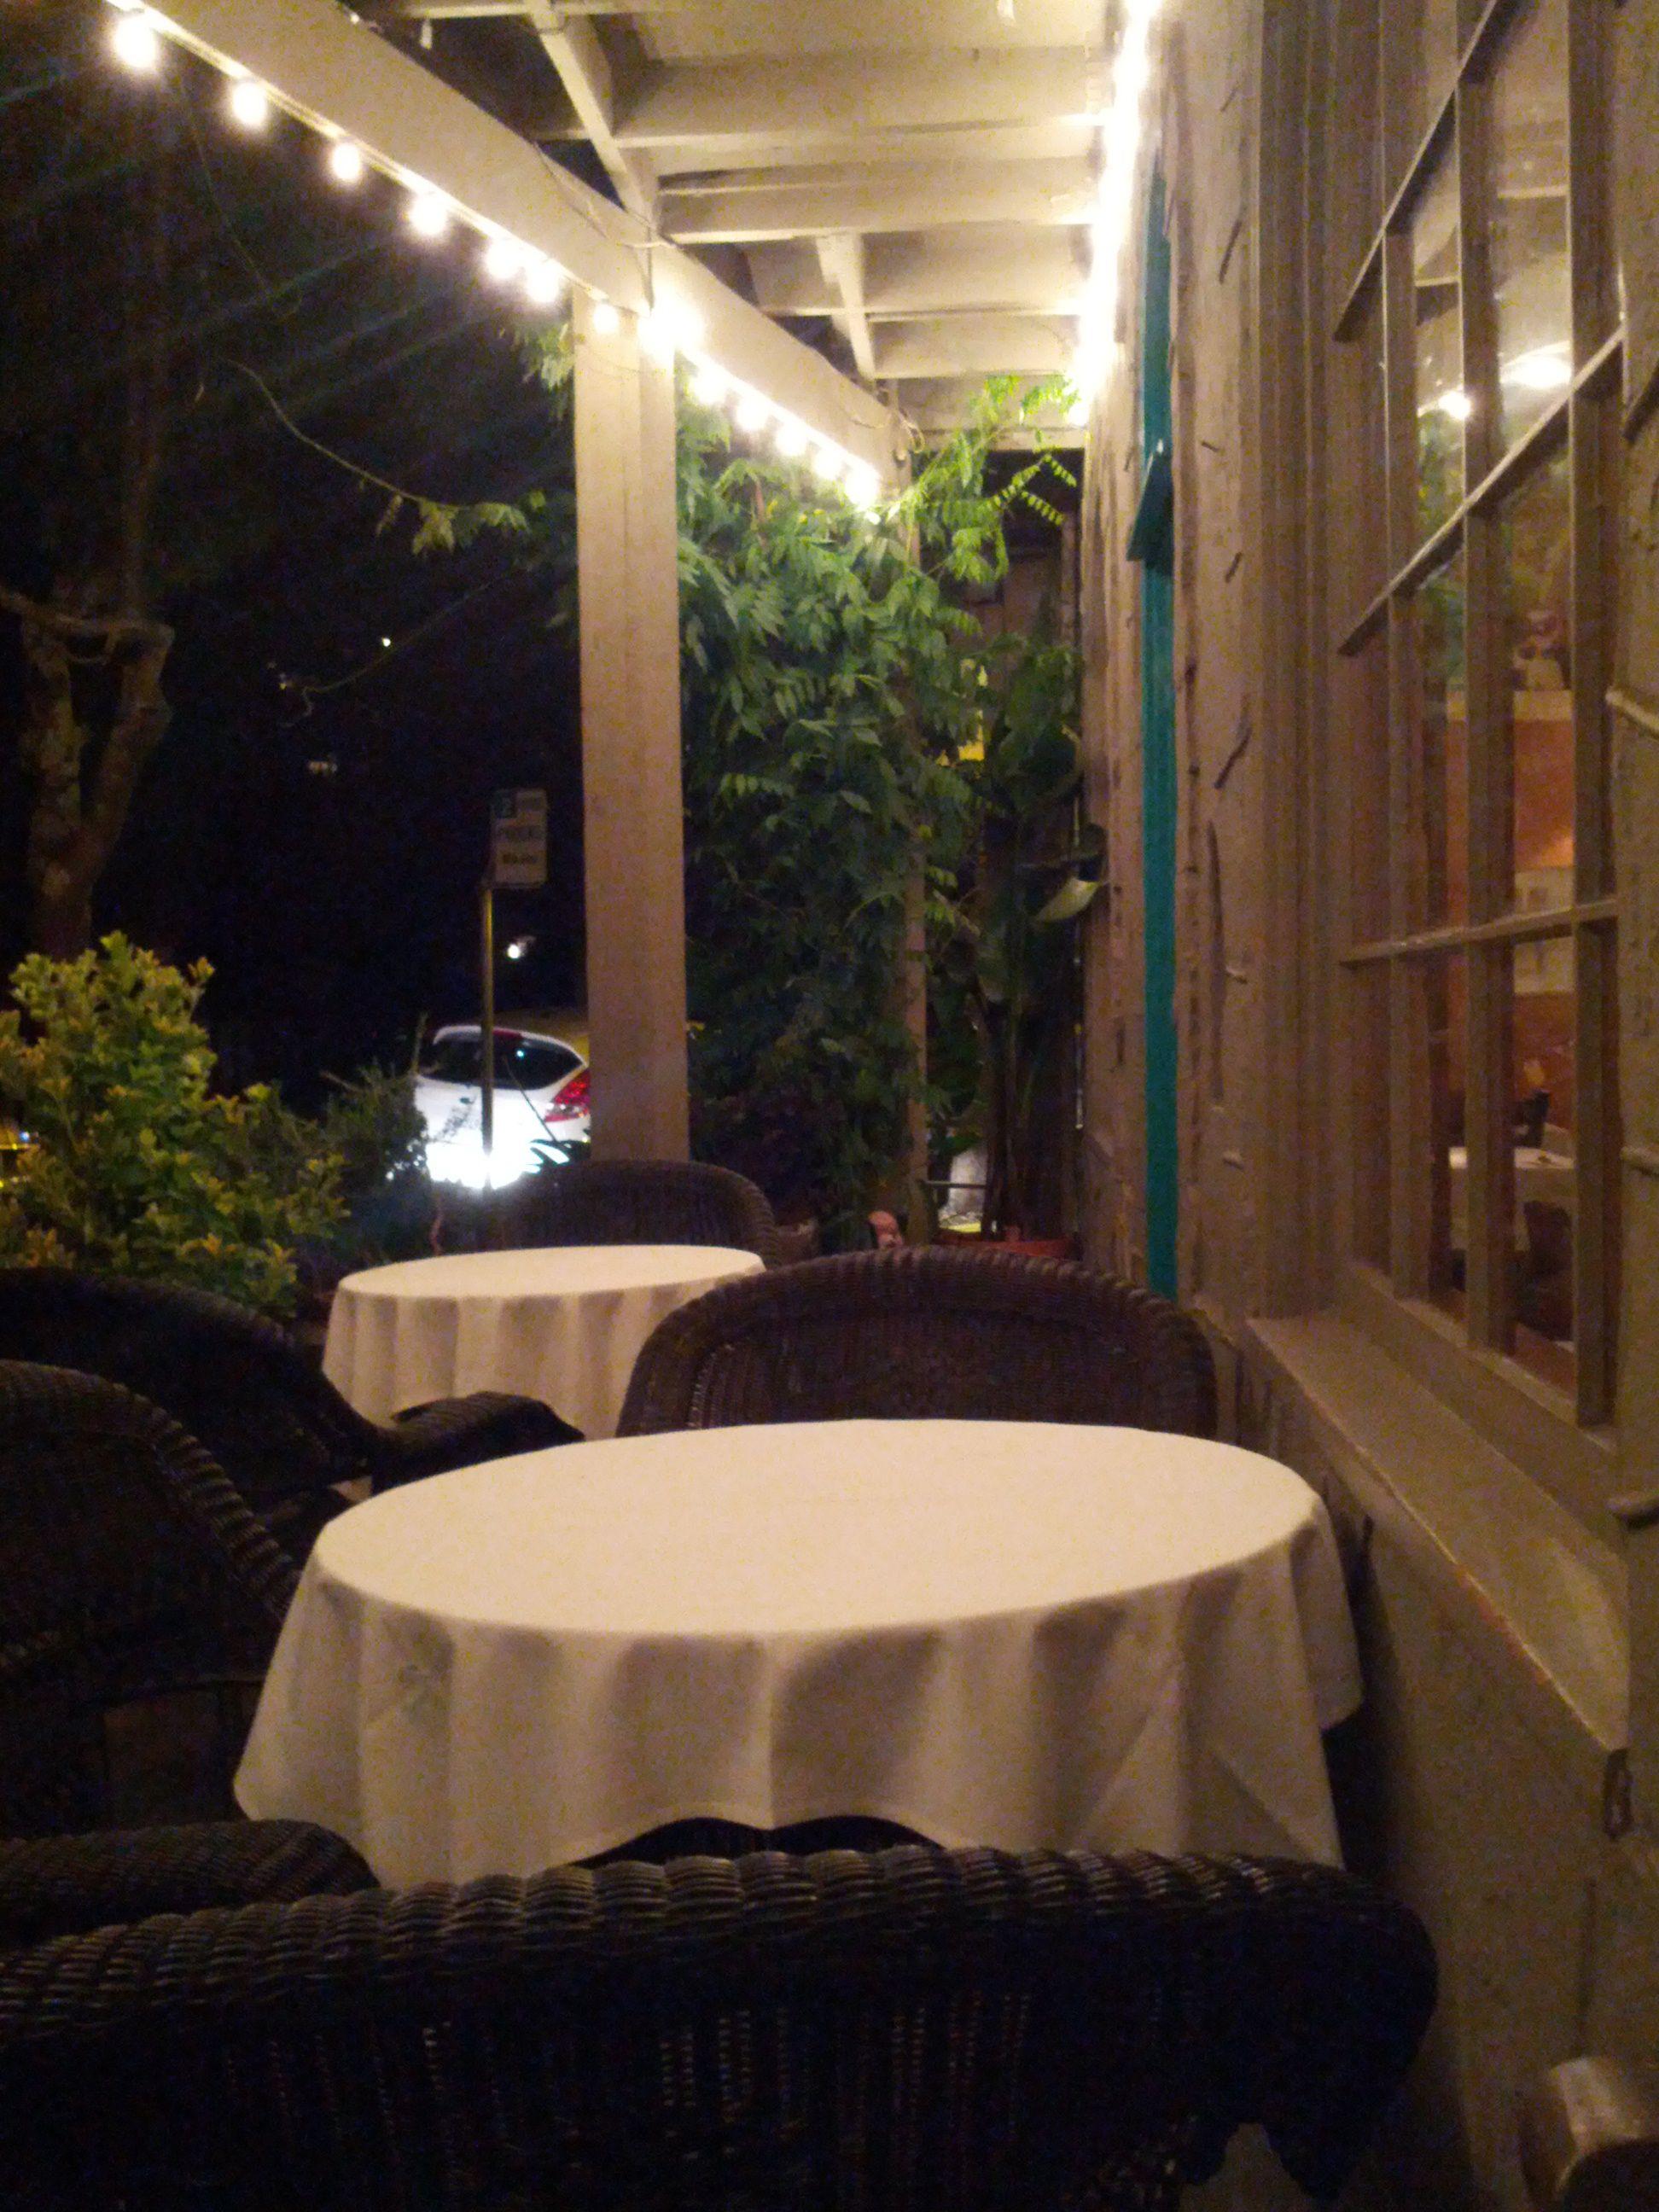 Panama Hotel Restaurant In San Rafael Ca